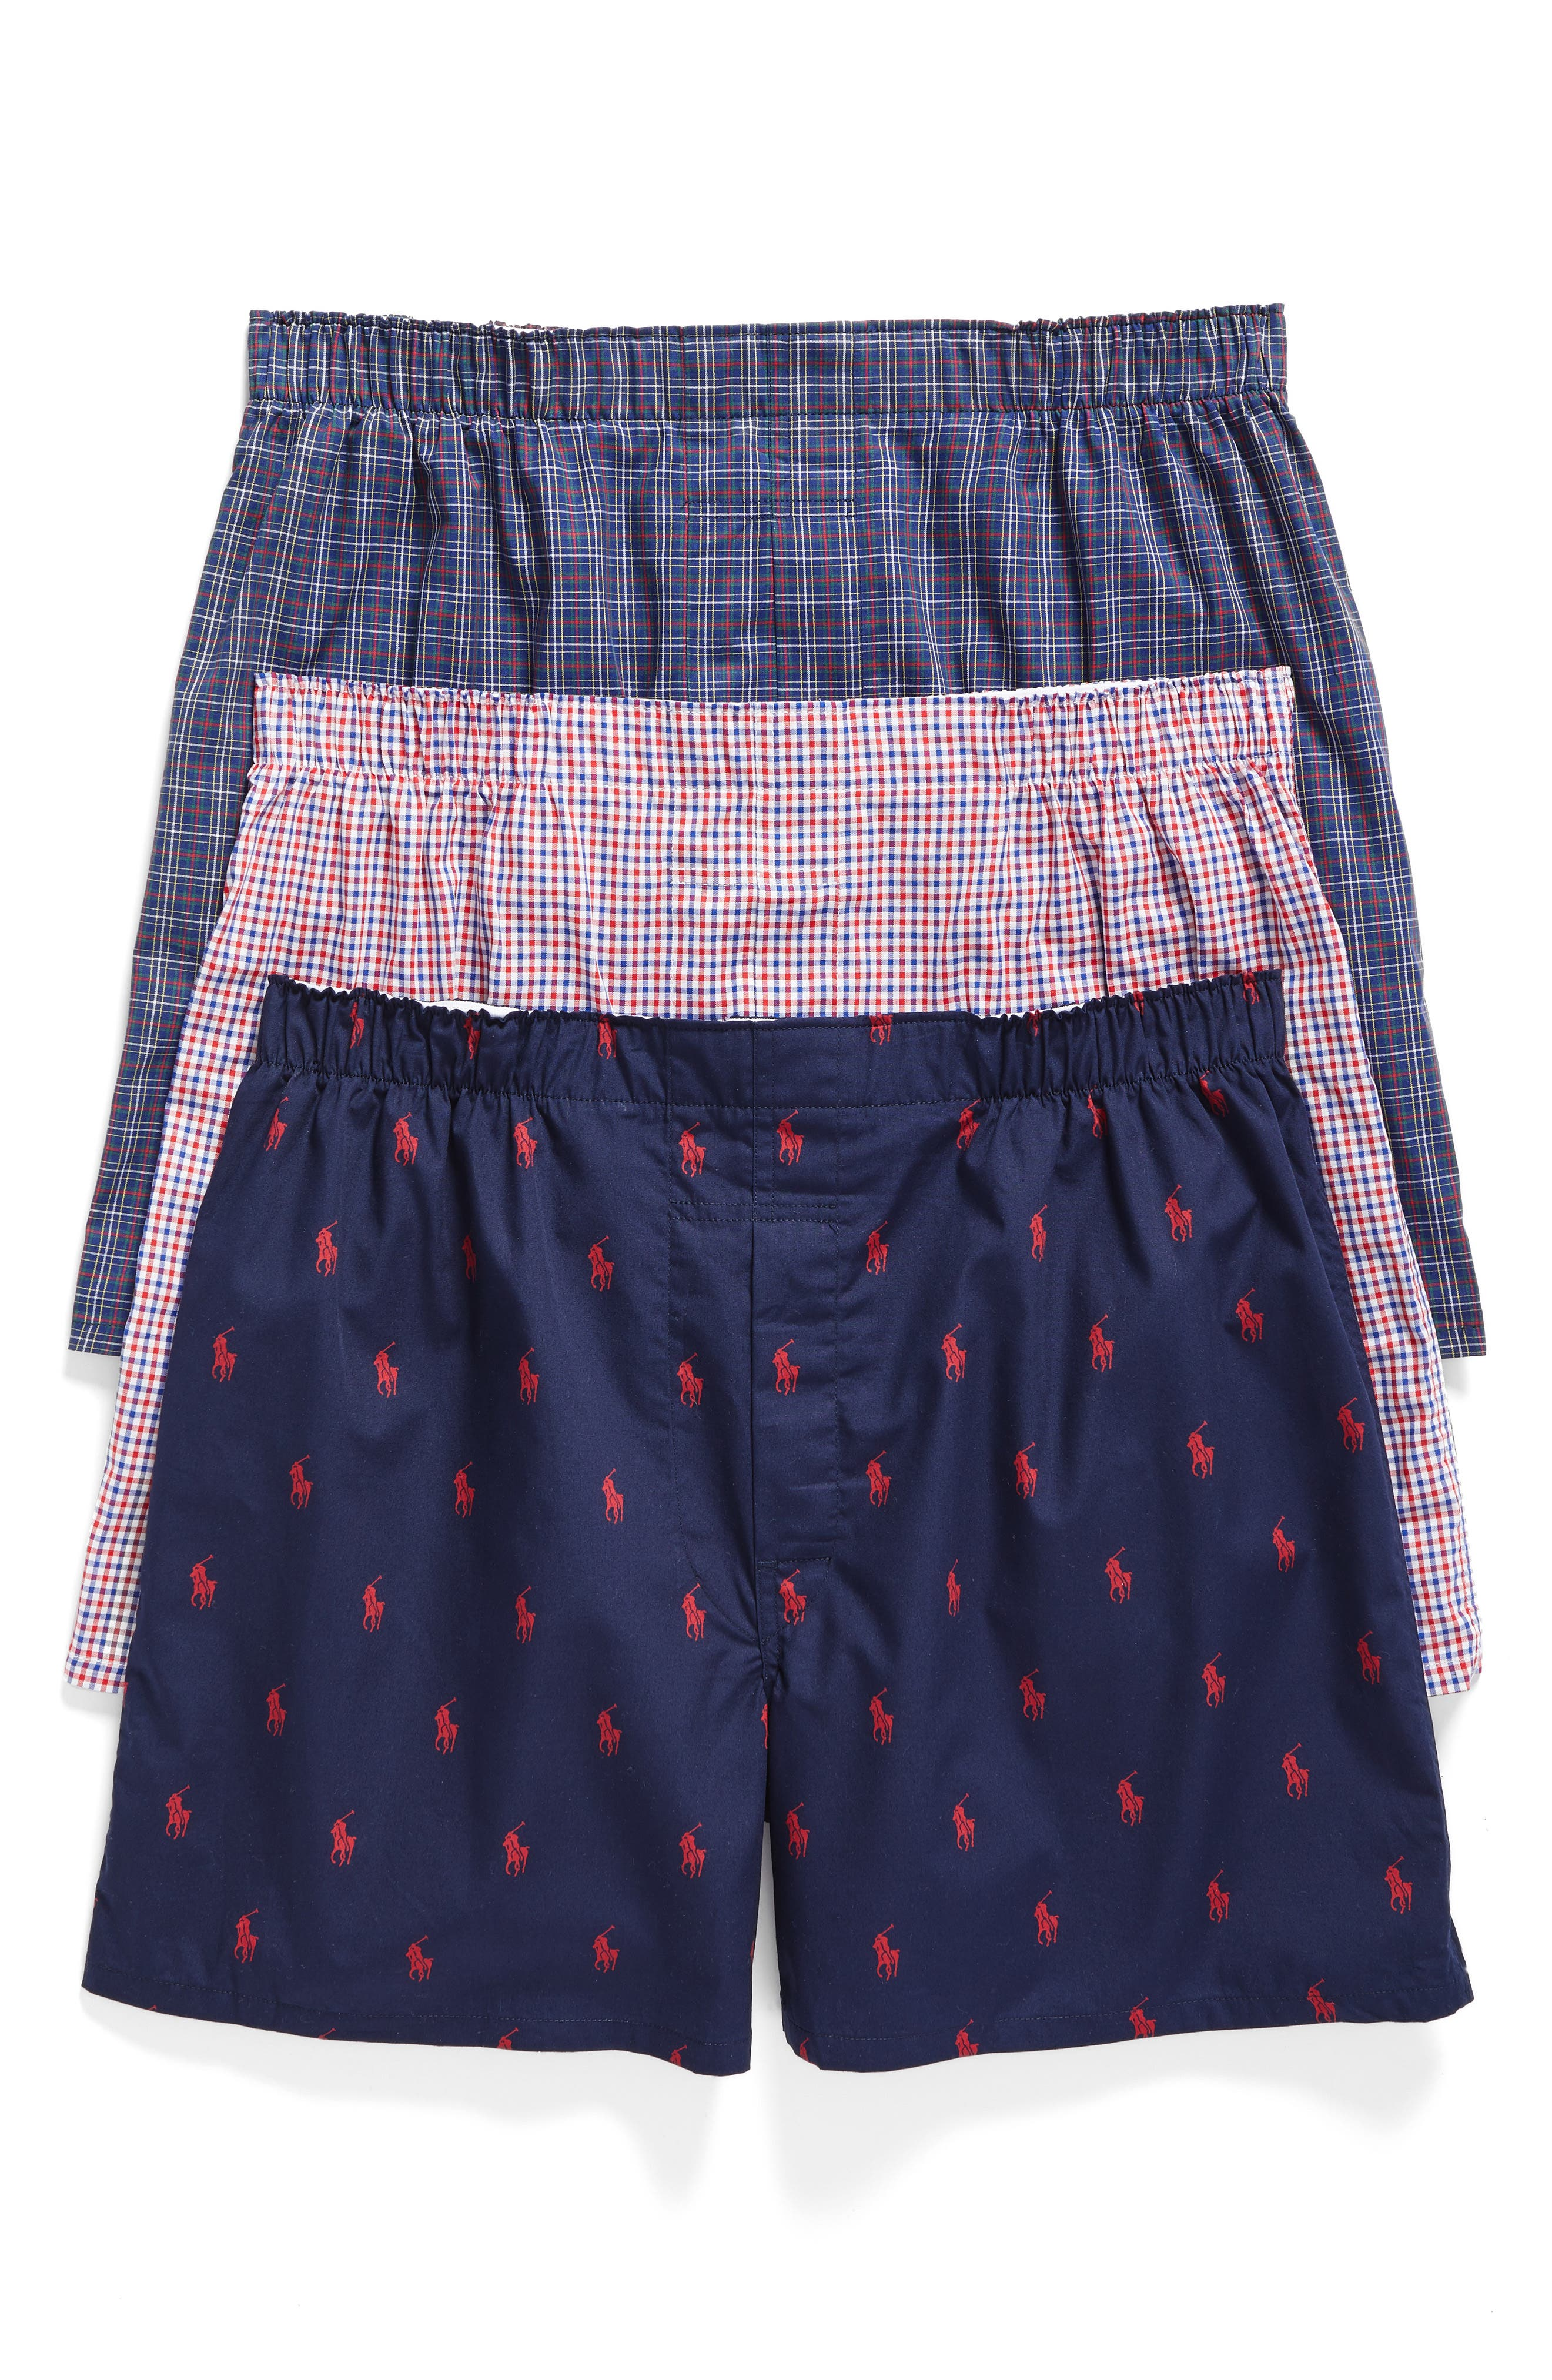 Main Image - Polo Ralph Lauren 3-Pack Woven Cotton Boxers